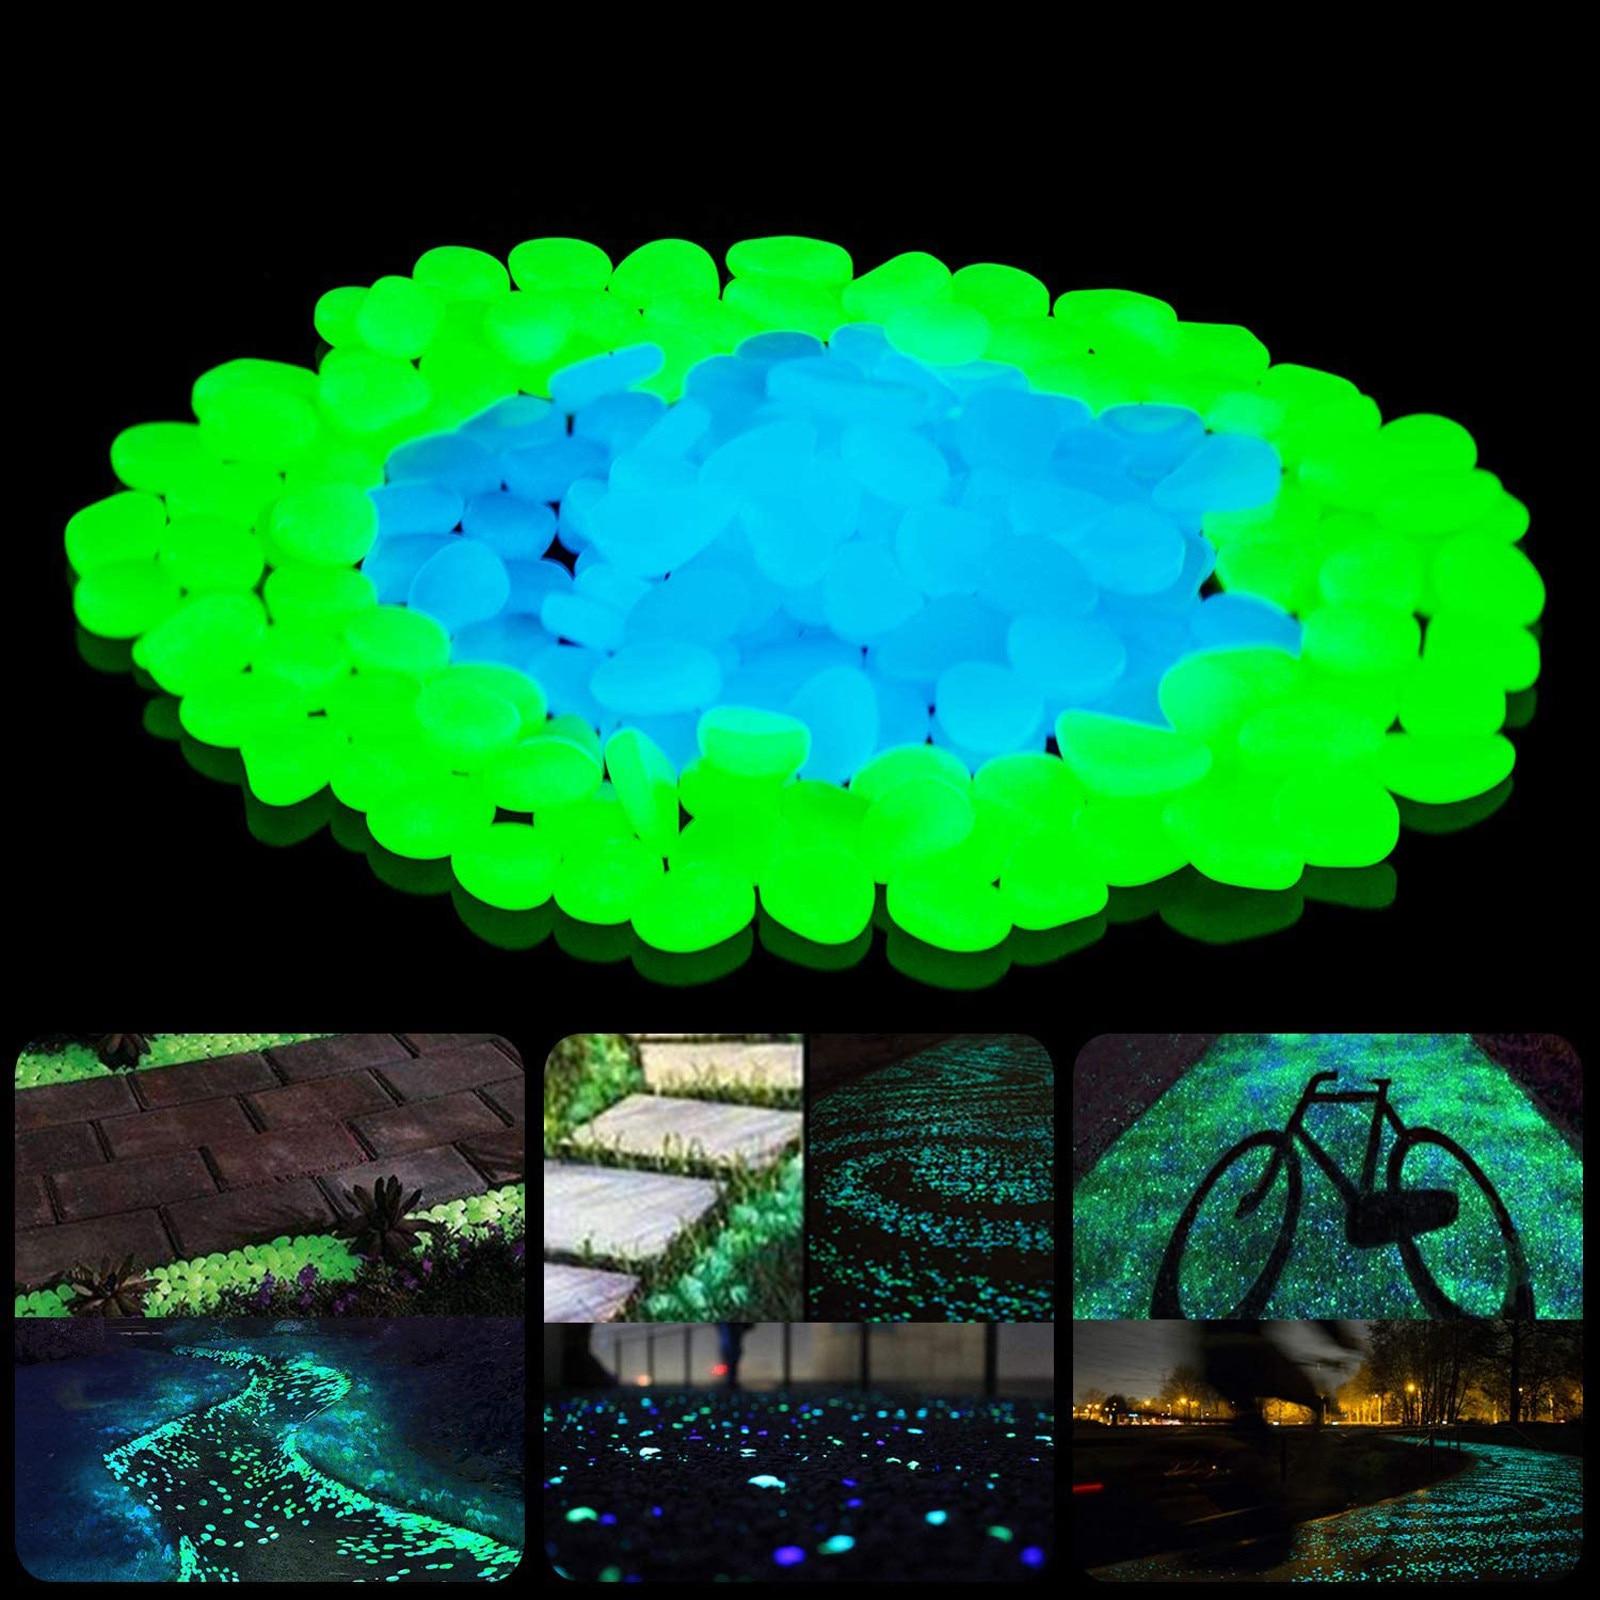 50PC DIY Decorative Luminous Stones For Yards Lawns Walkways Garden Plants leuchtsteine Garden Decor Outdoor Glow In The dark